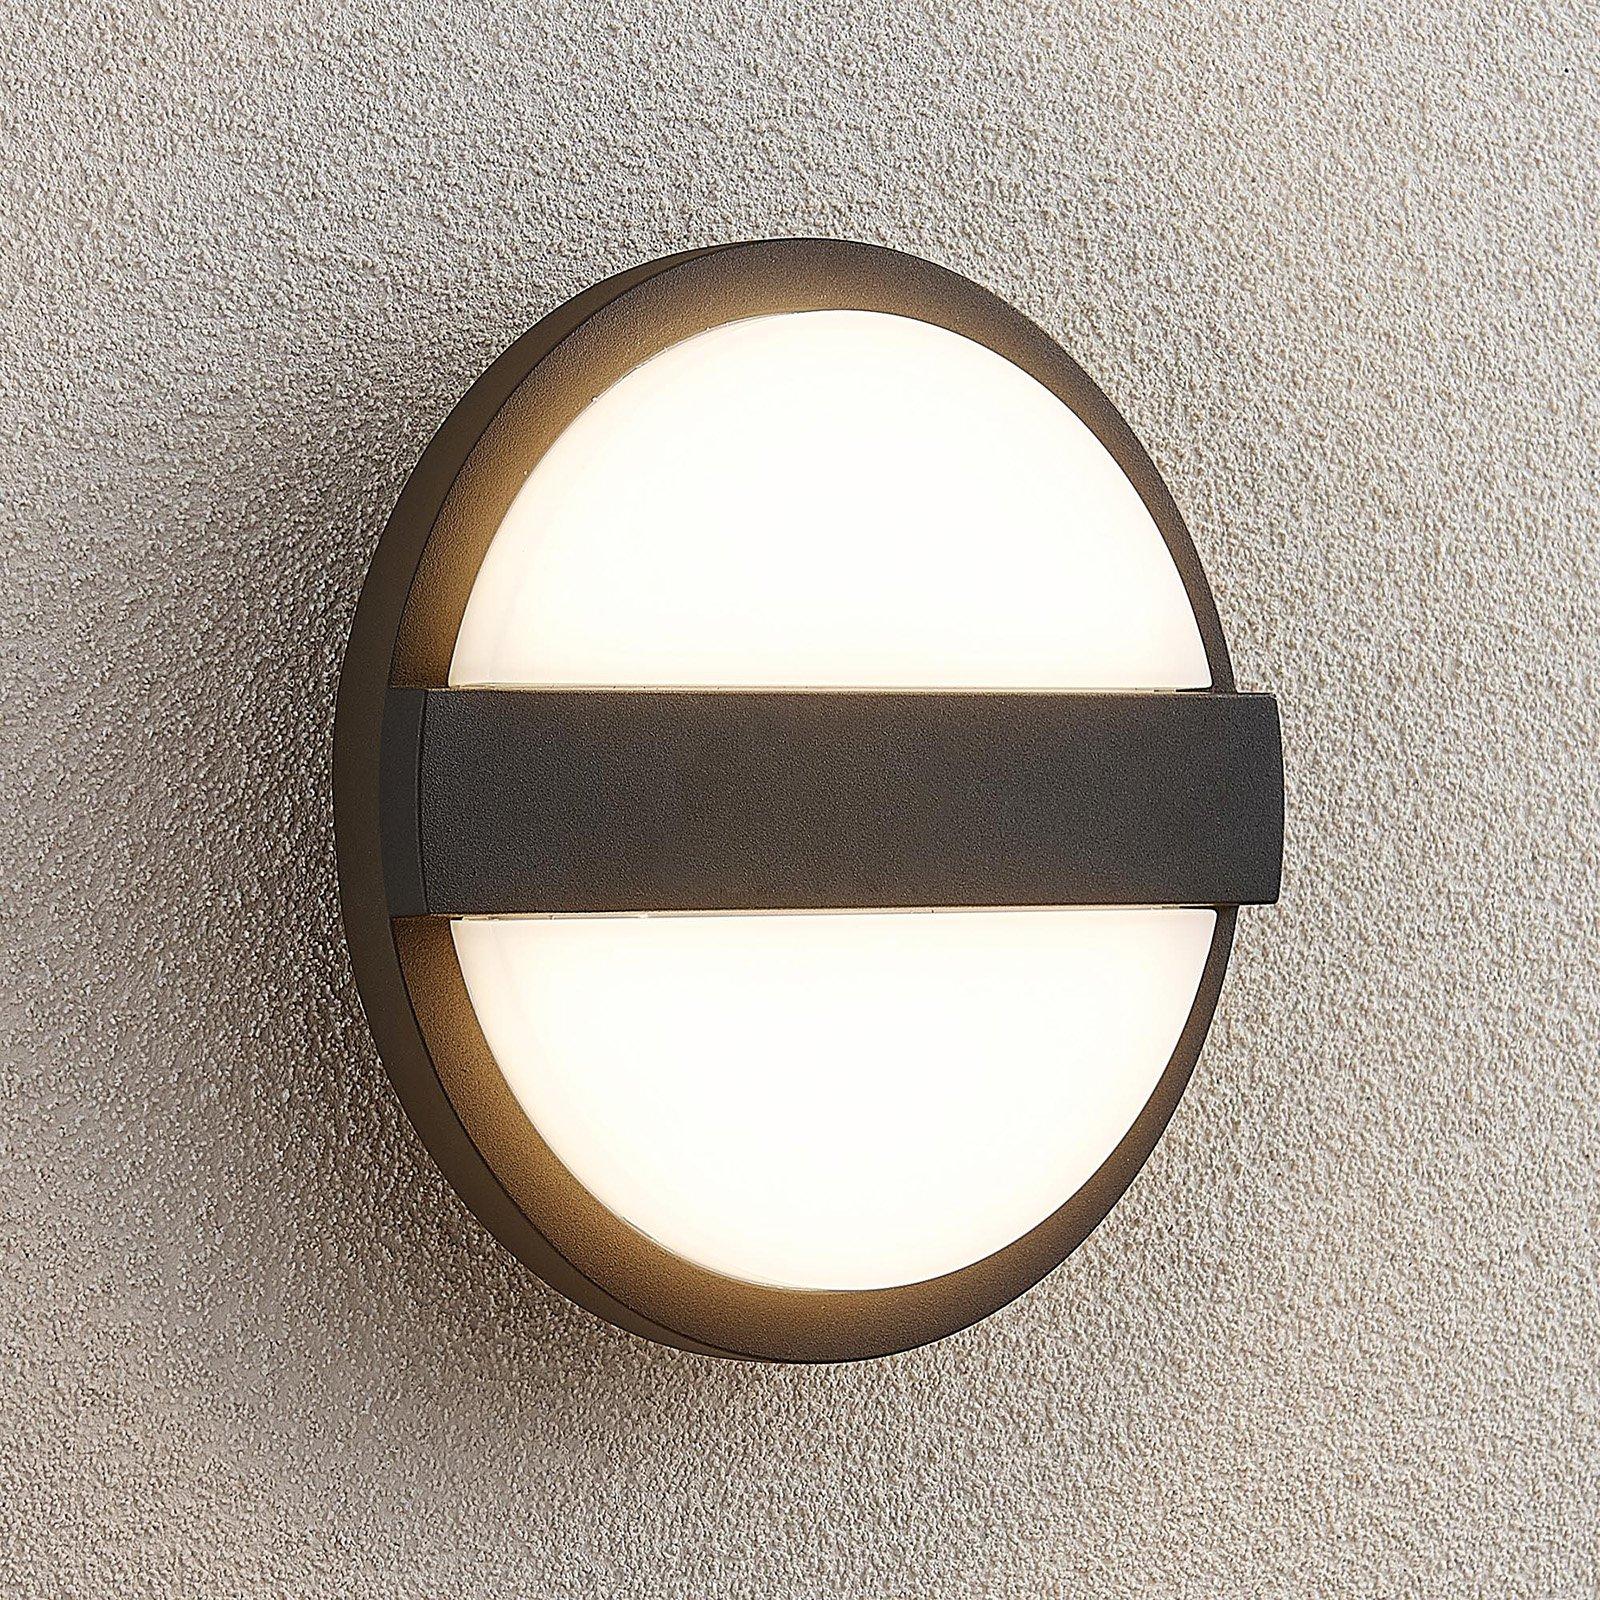 Lucande Gylfi LED-vegglampe, rund